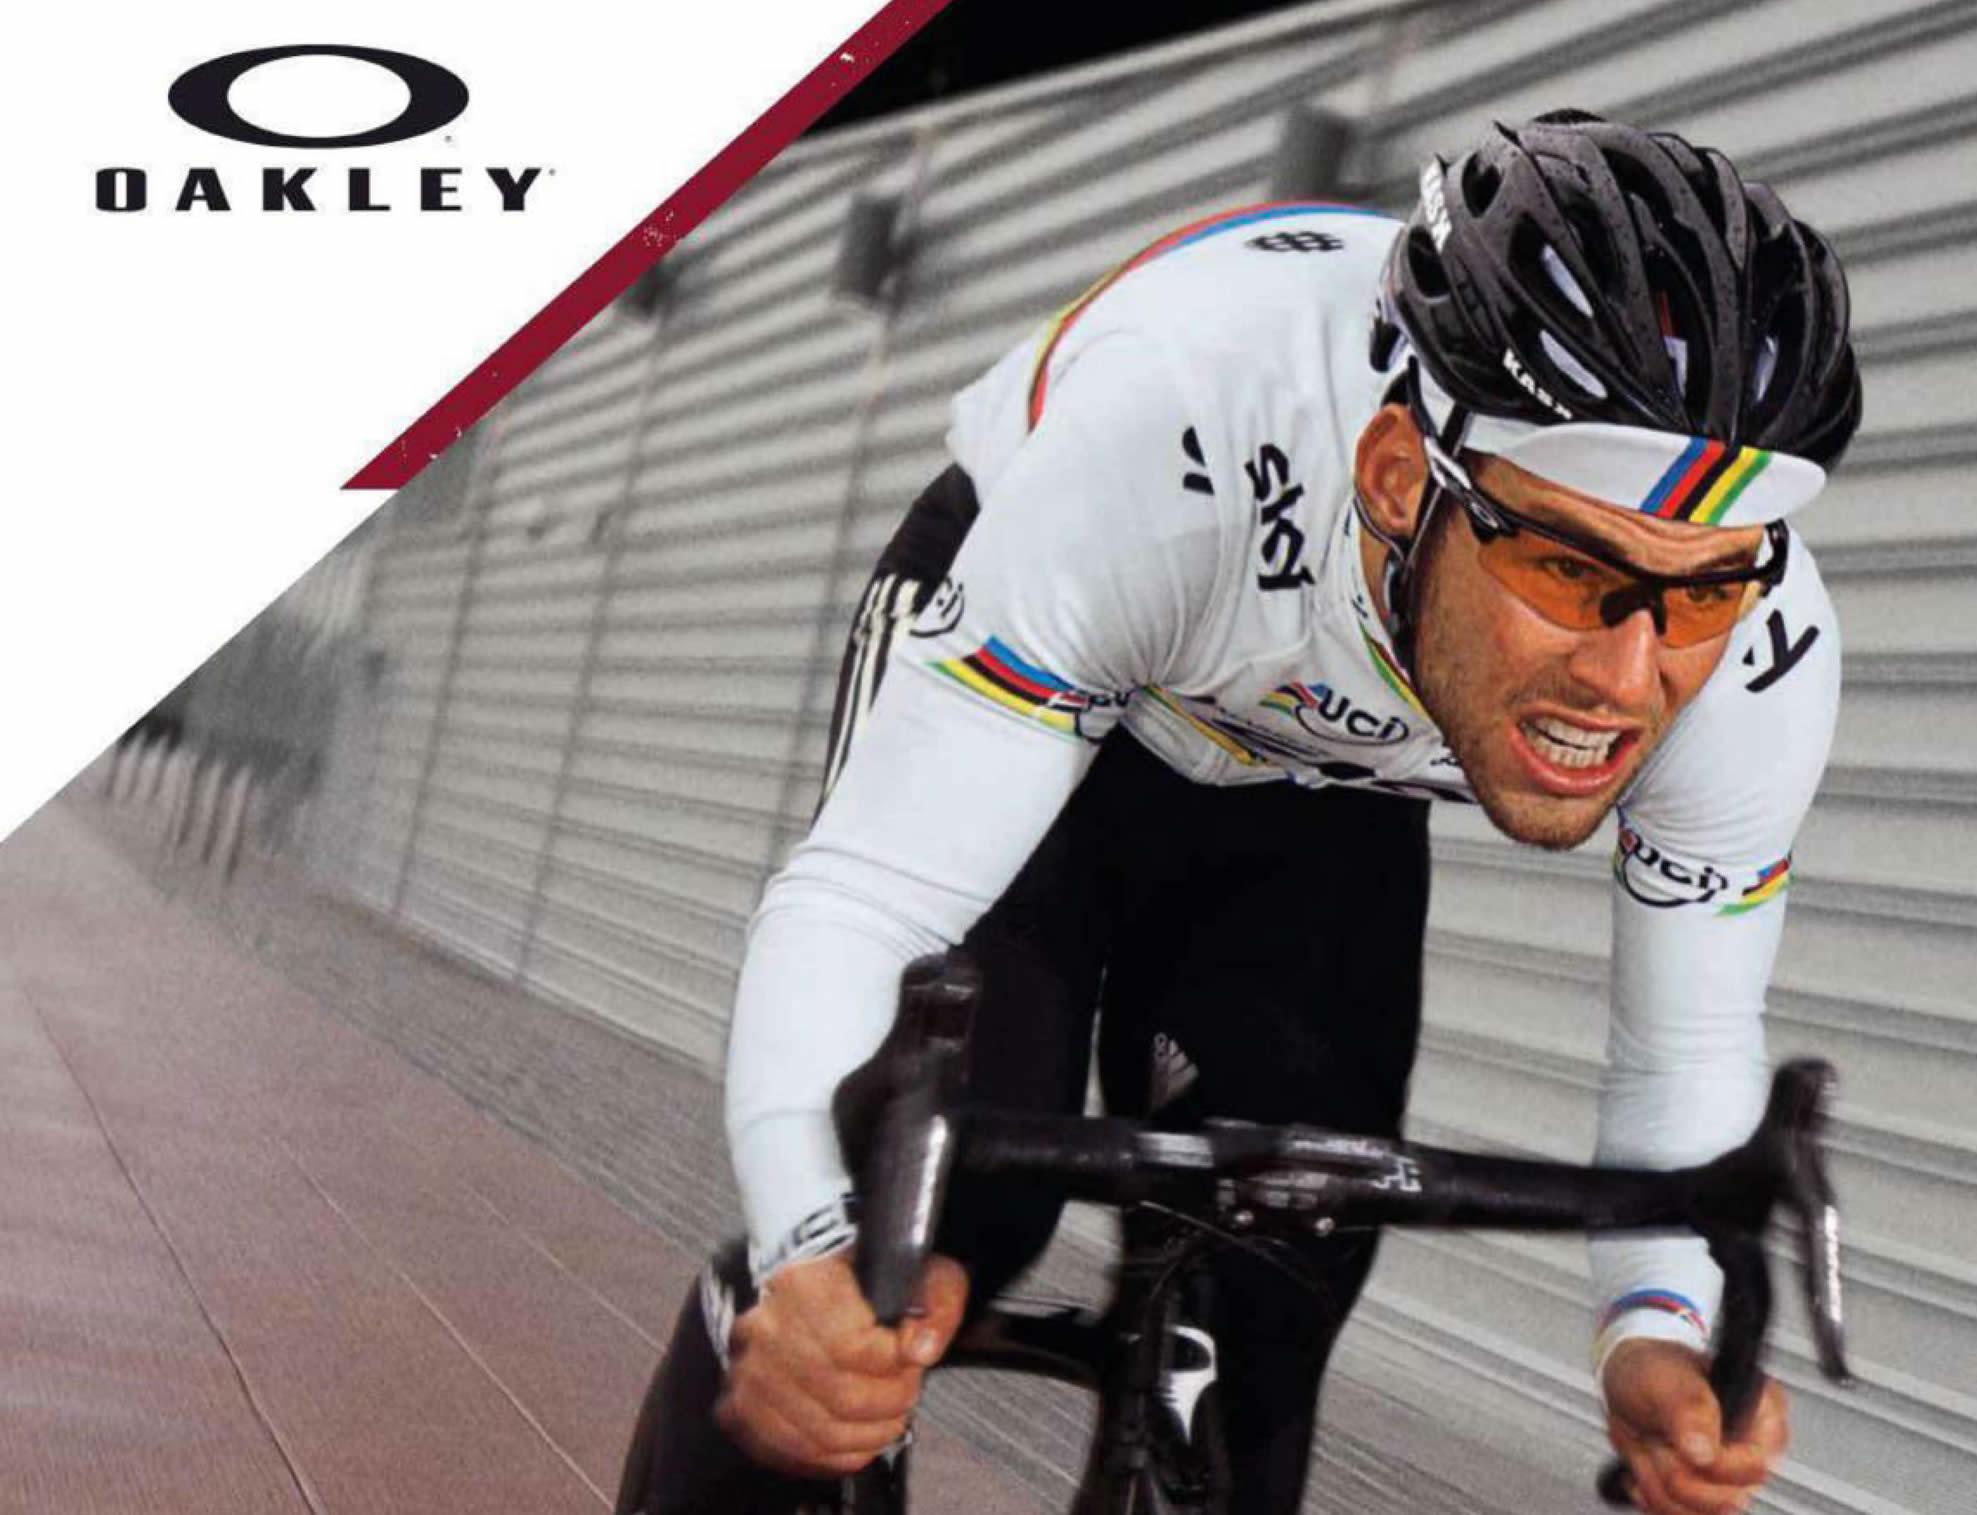 a43e1f489e1 Oakley Mark Cavendish - Cycling Wallpaper